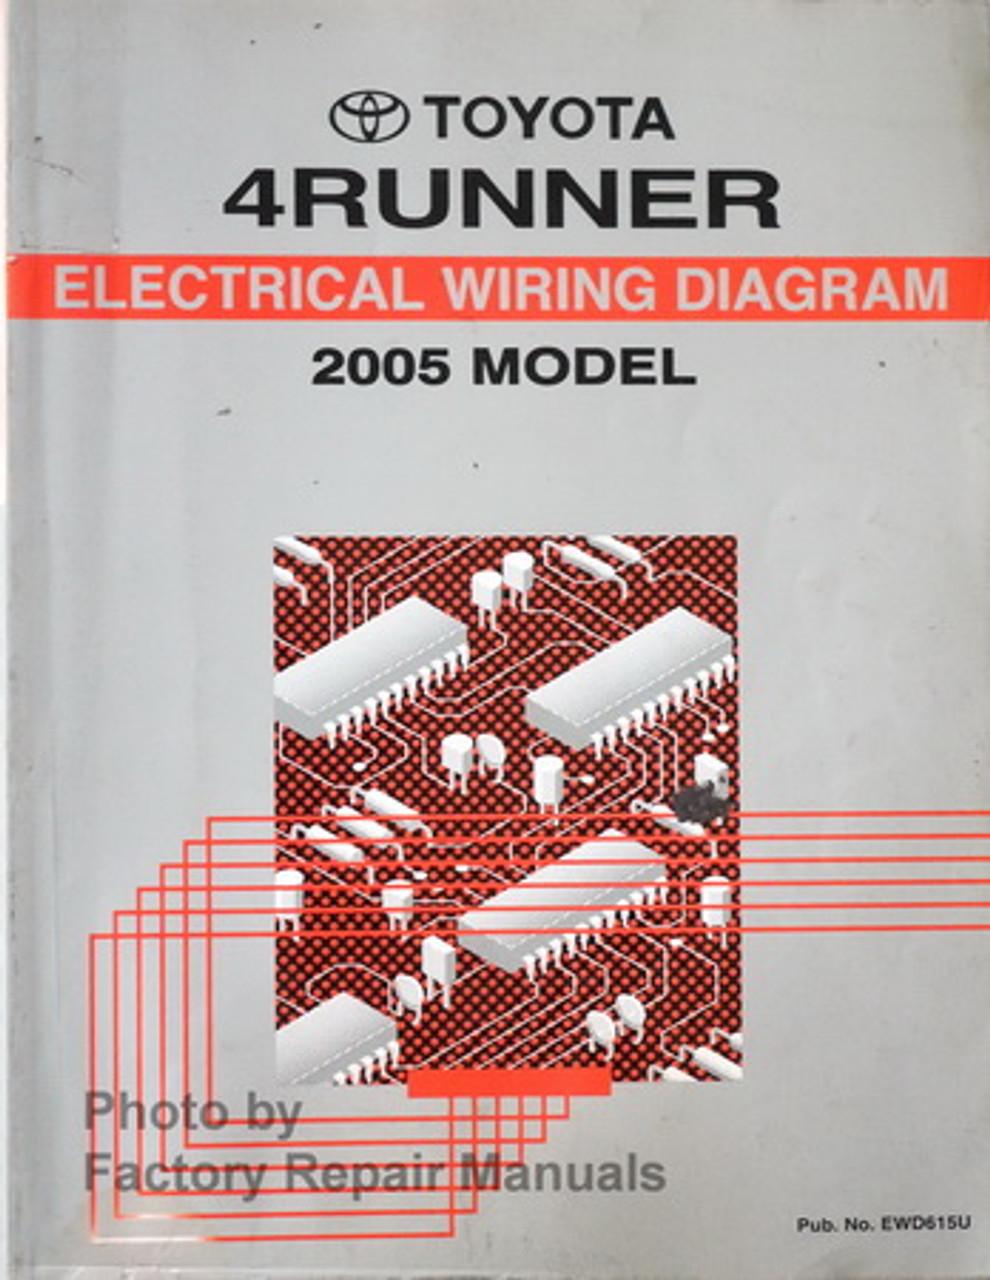 2005 toyota 4runner electrical wiring diagrams manual - factory repair  manuals  factory repair manuals